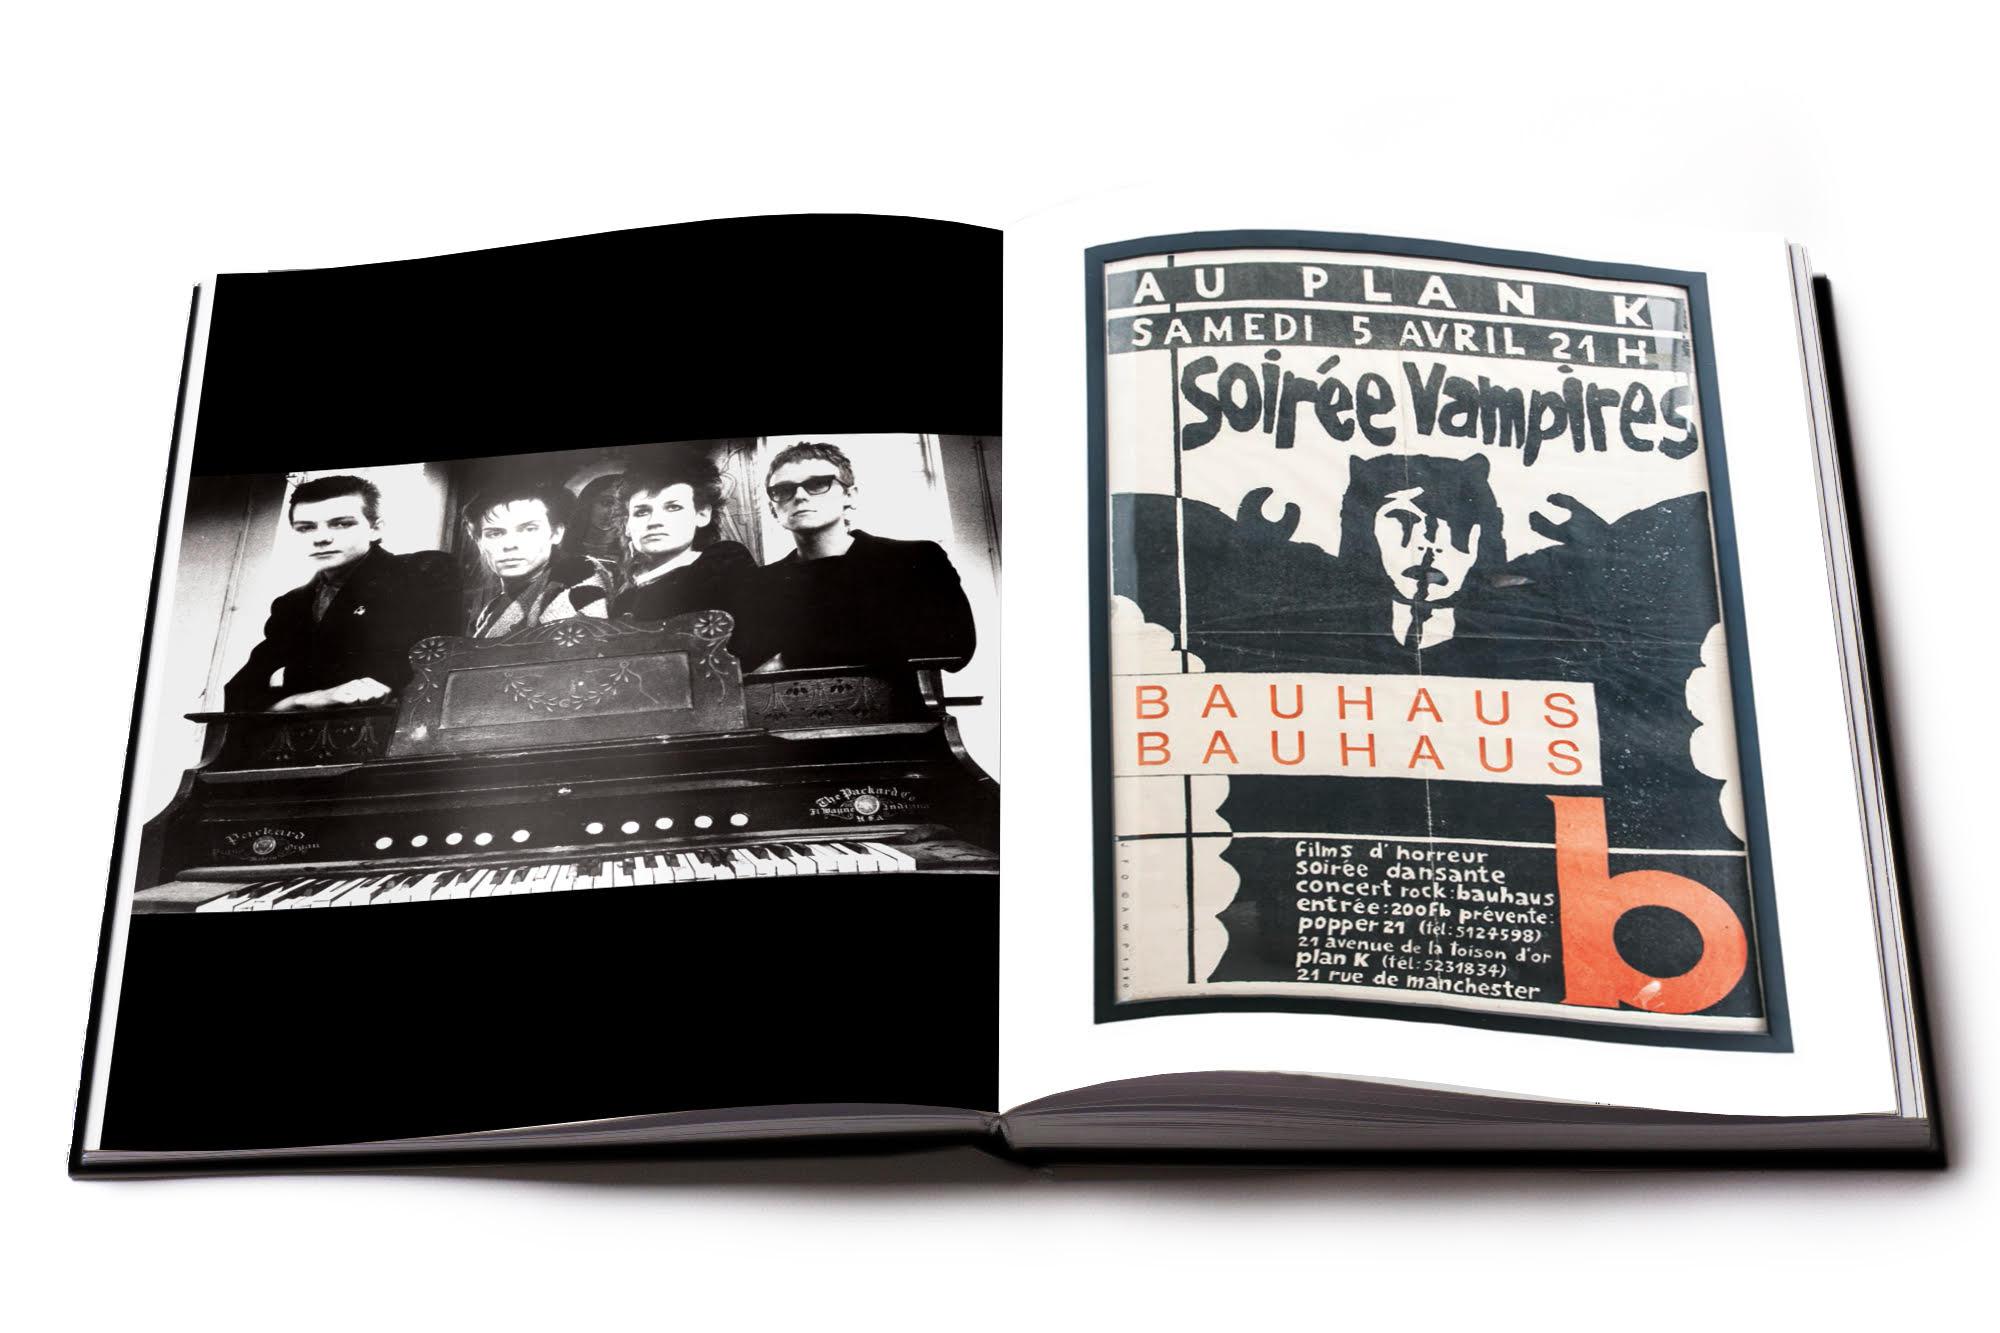 KEVIN HASKINS - Bauhaus - Undead' Art Book 2 Iyezine.com